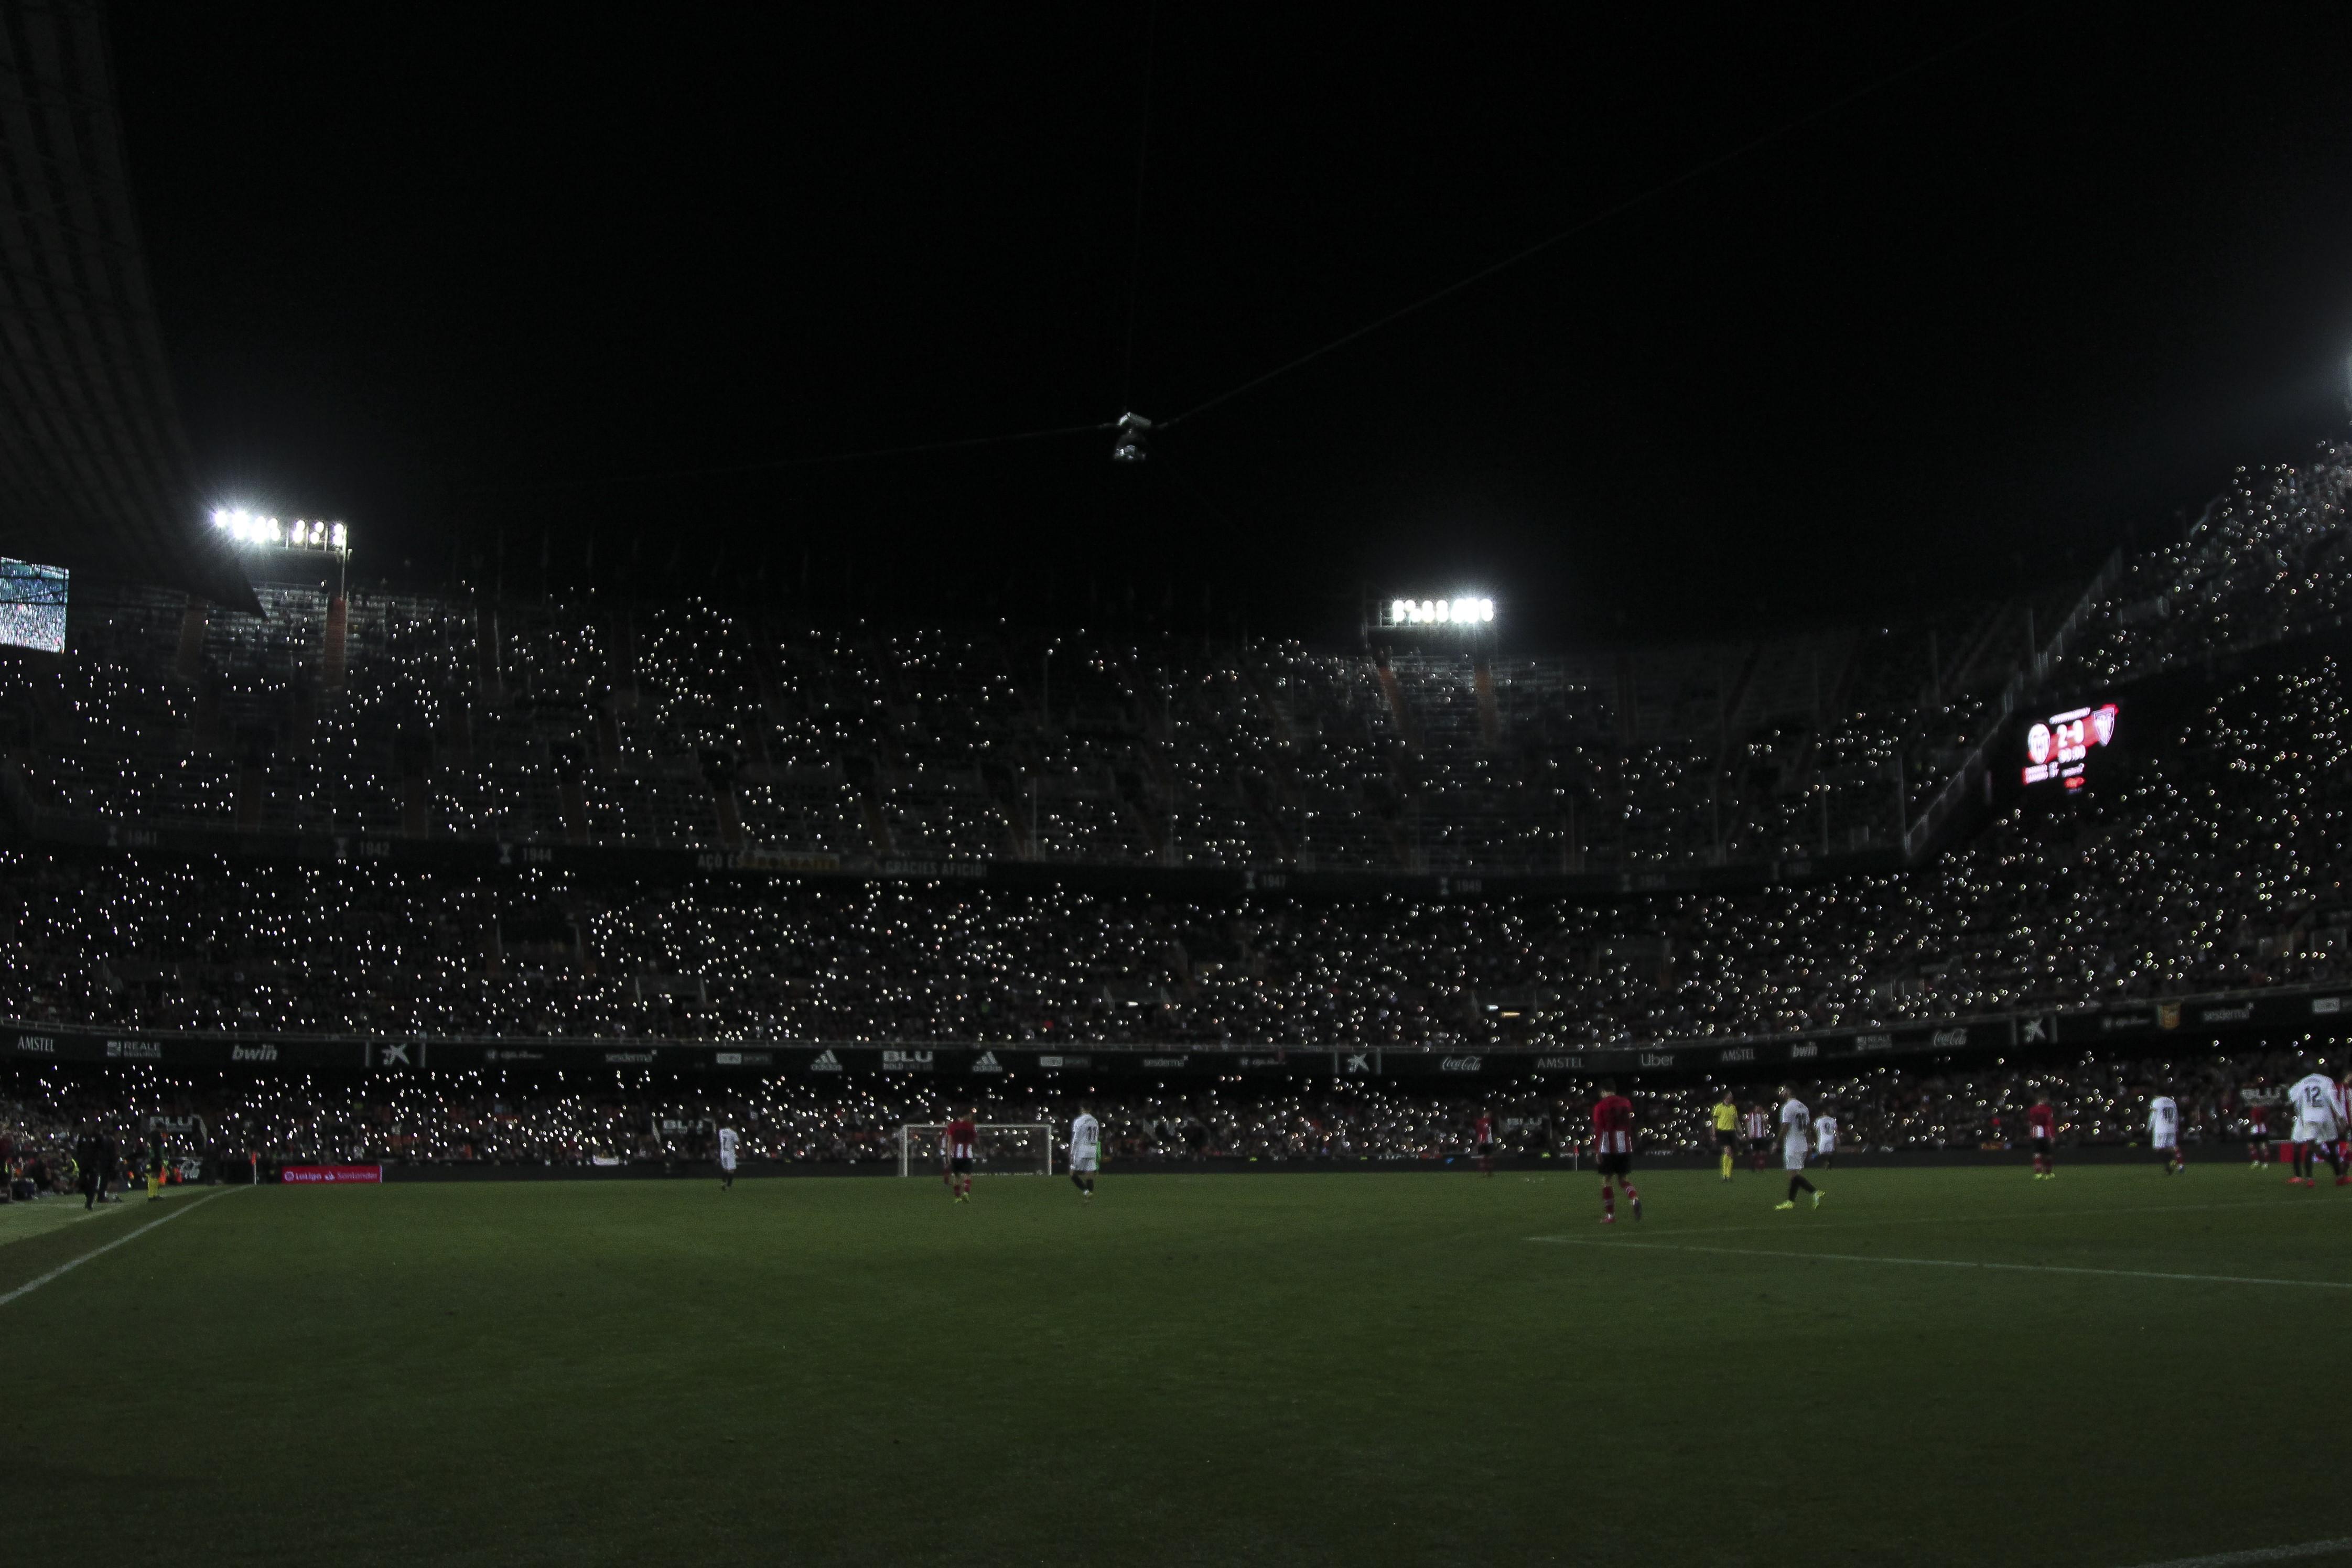 Le stade Mestalla à Valence